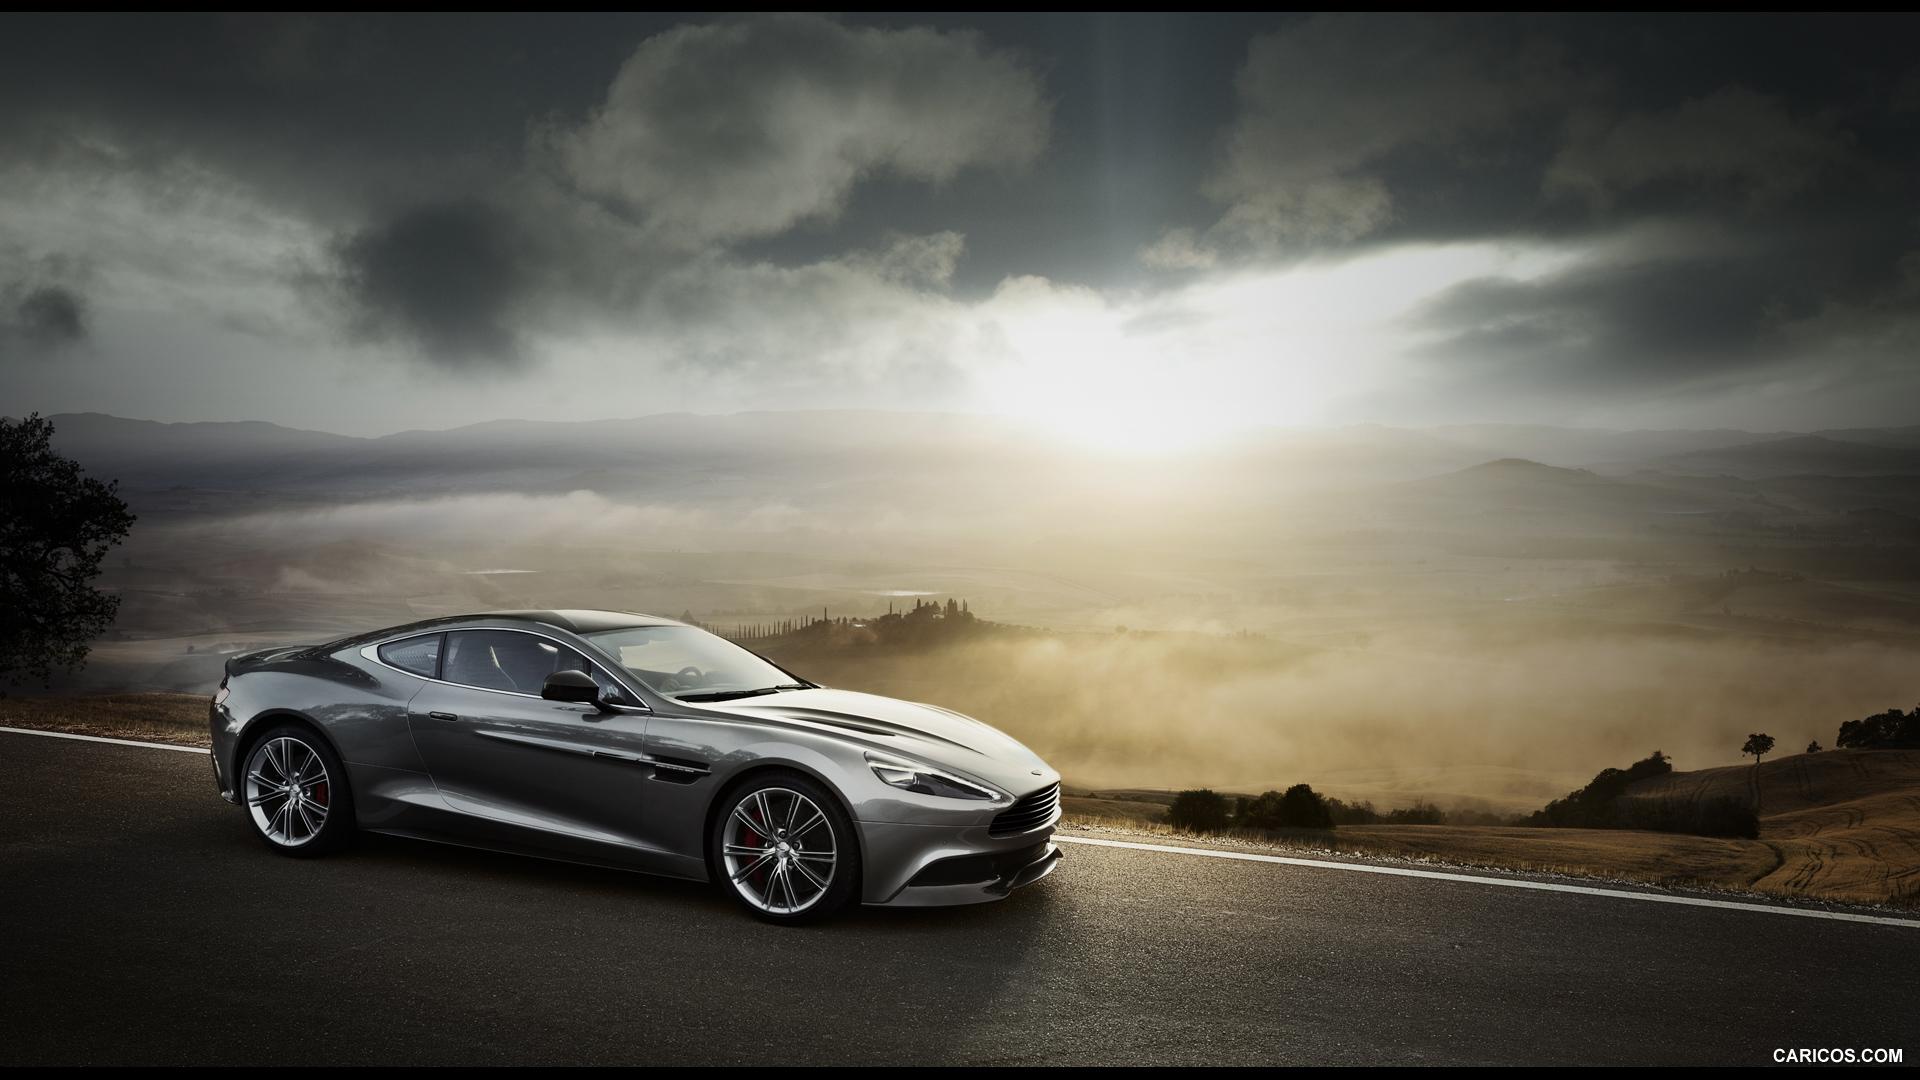 Aston Martin V8 Vantage S Dragon 88 Wallpapers | Car wallpapers HD ...